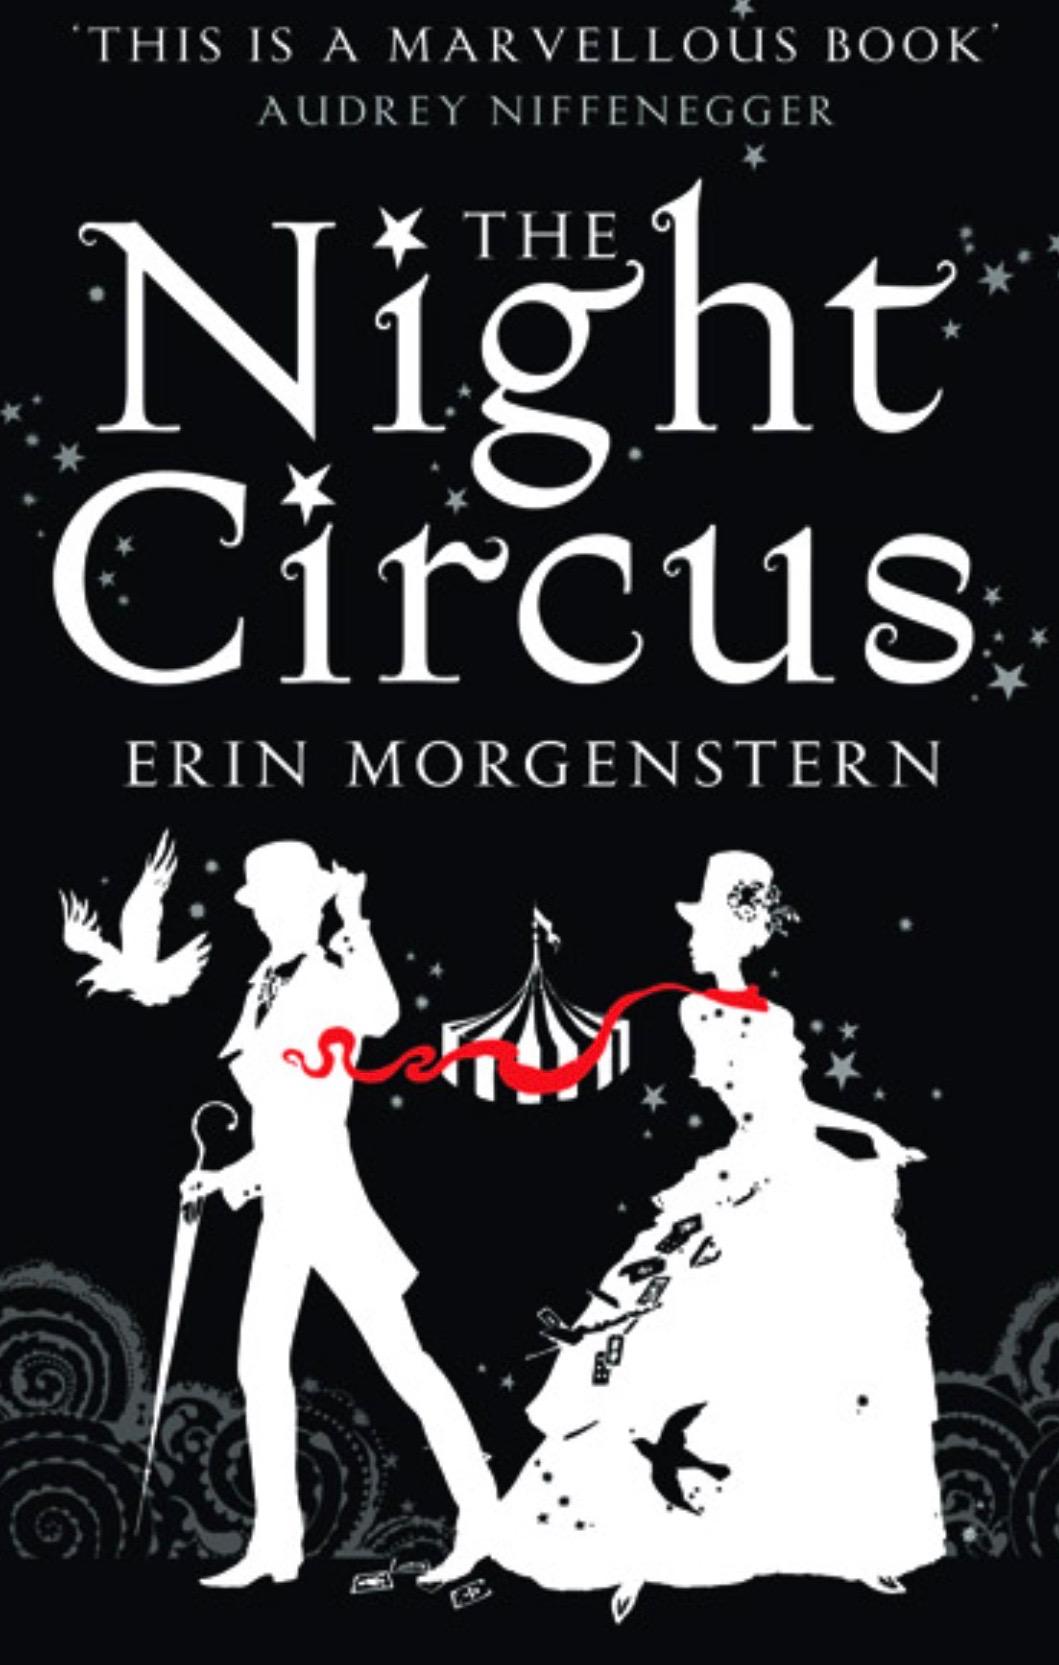 the Night Circus Book Jacket 2